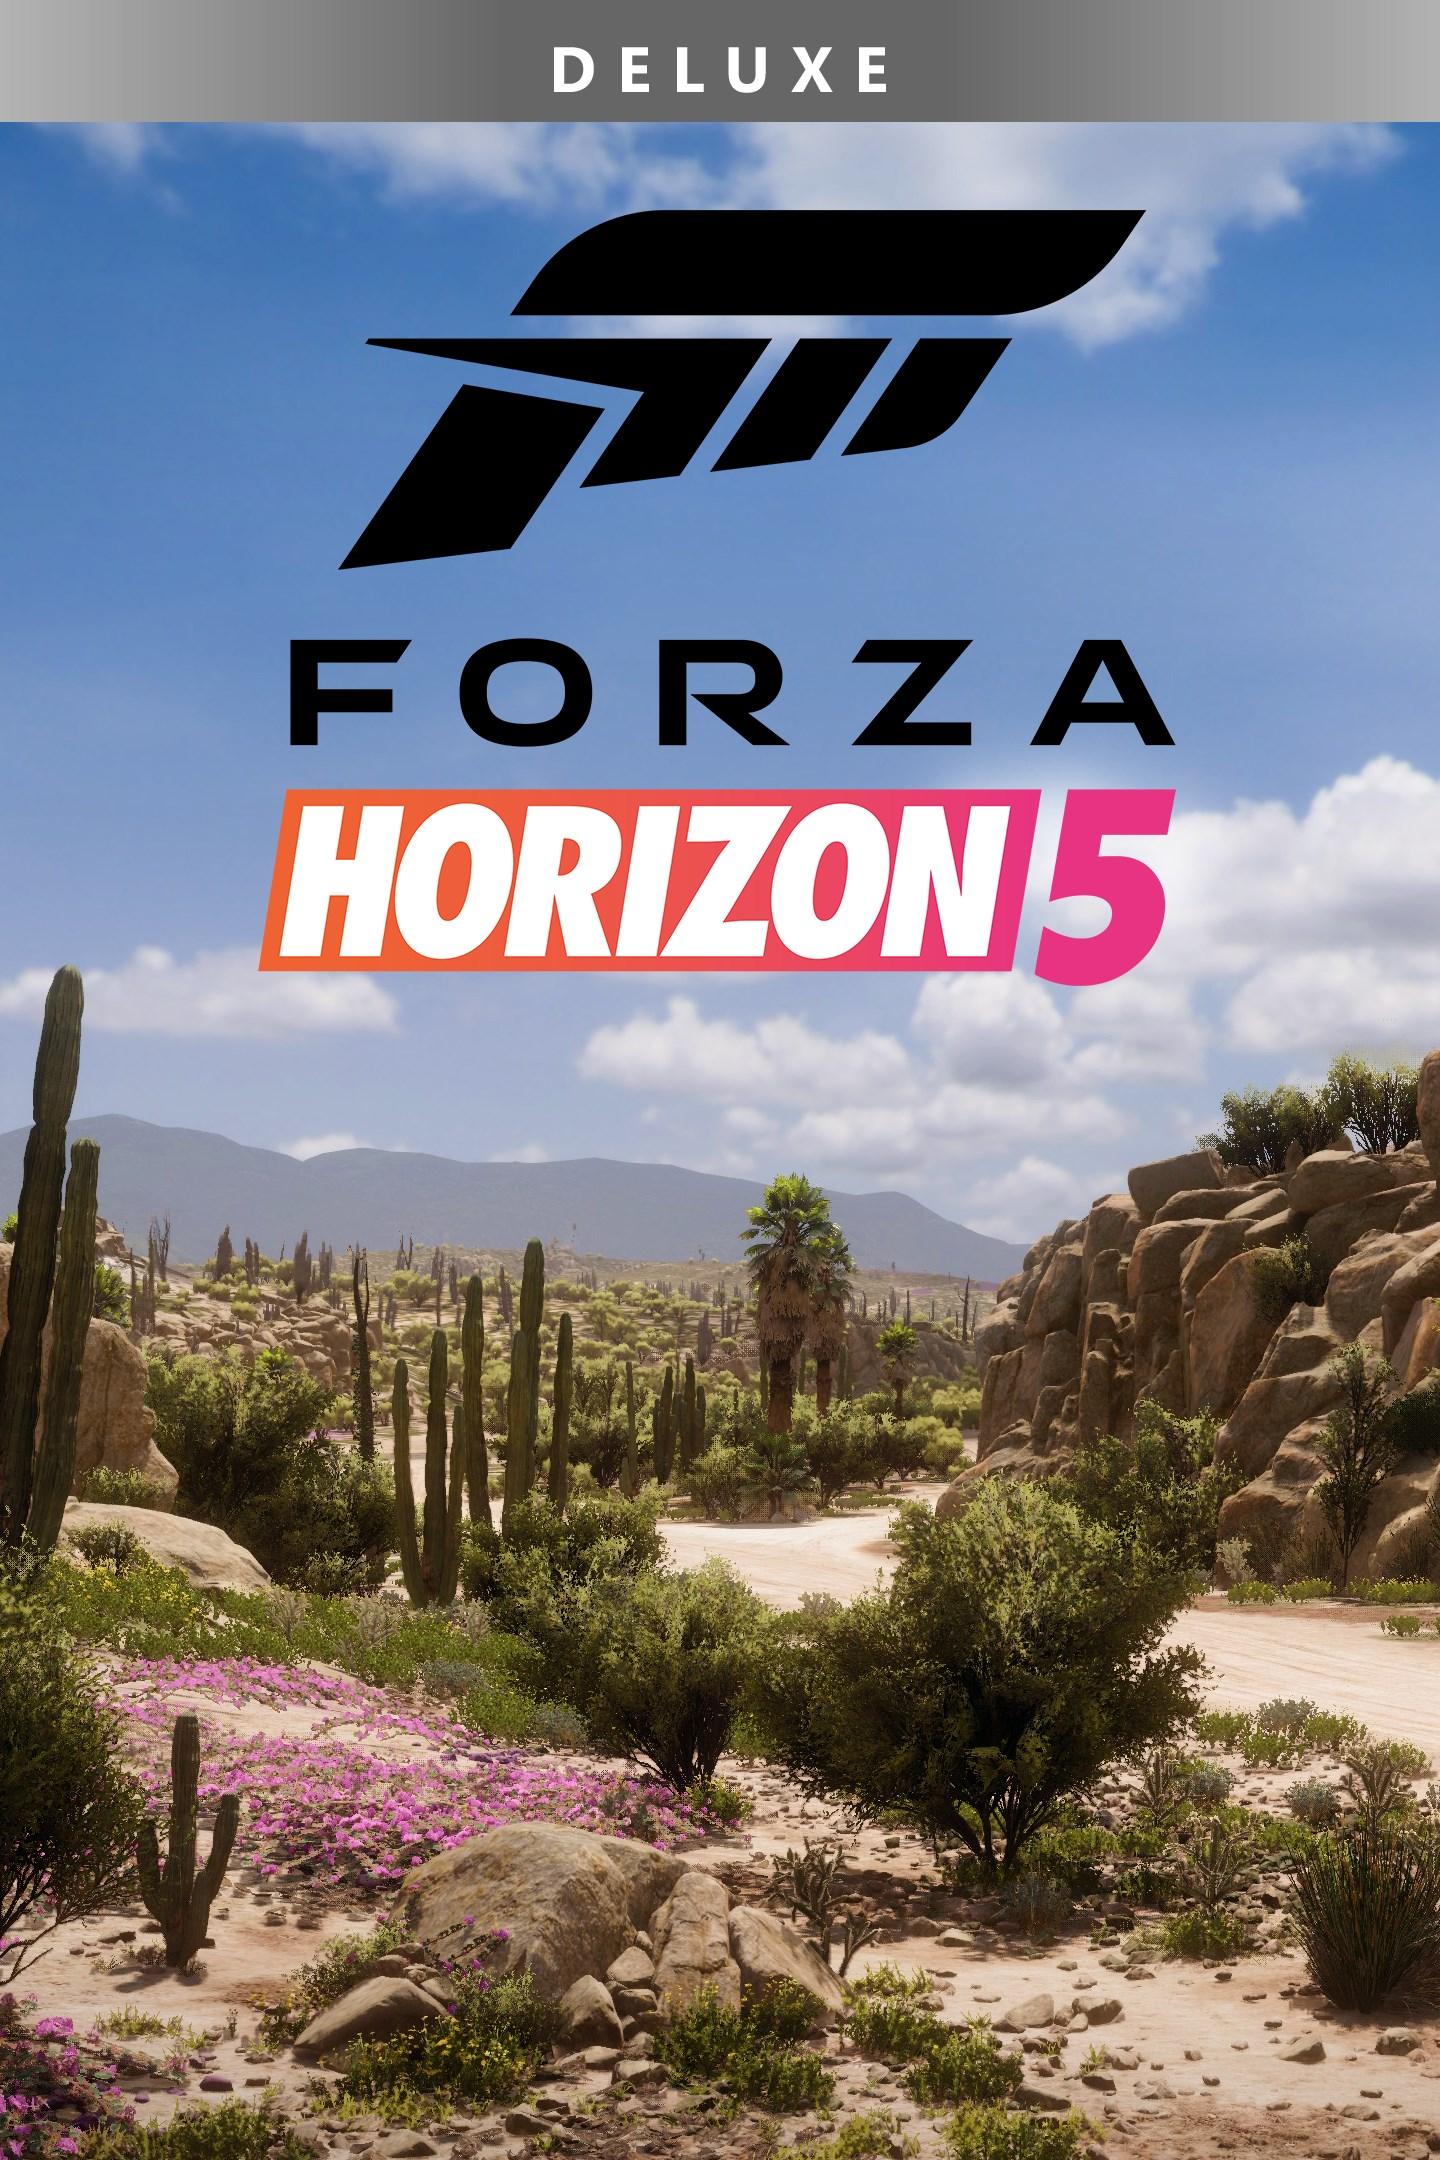 Forza Horizon 5 Deluxe Edition box shot